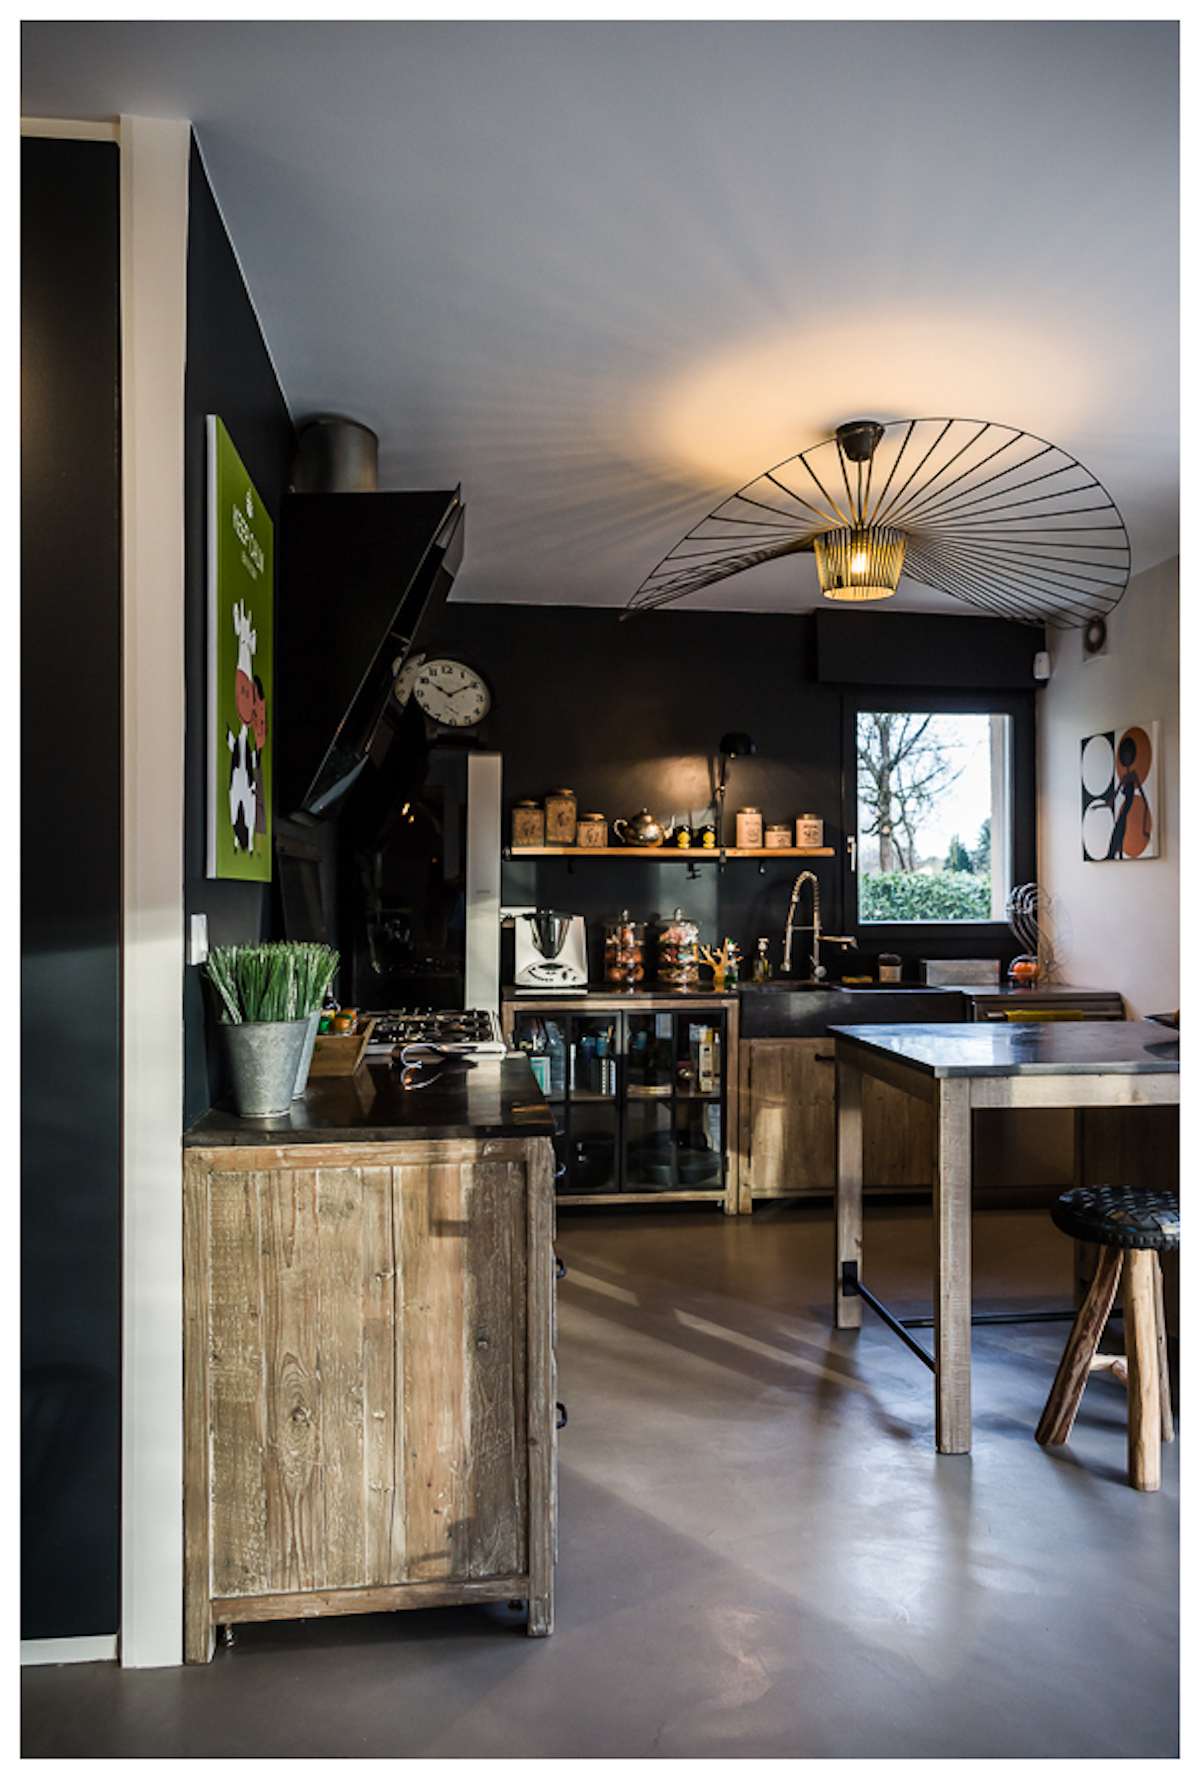 Renovation-decoration-maison-77-carre-4-original